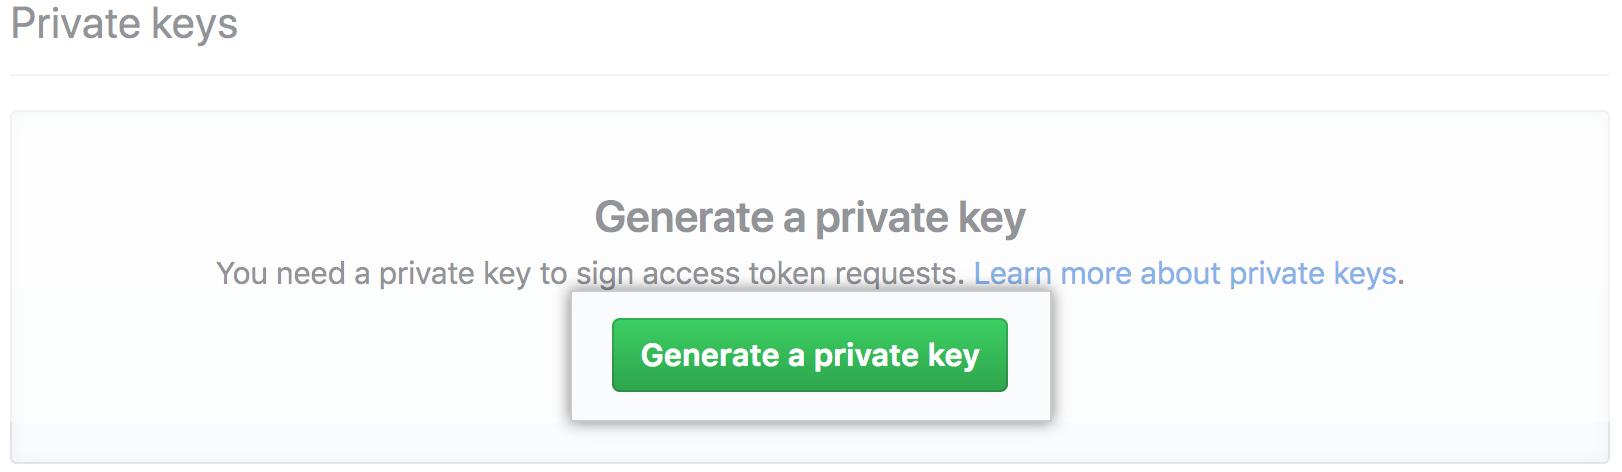 Gerar chave privada